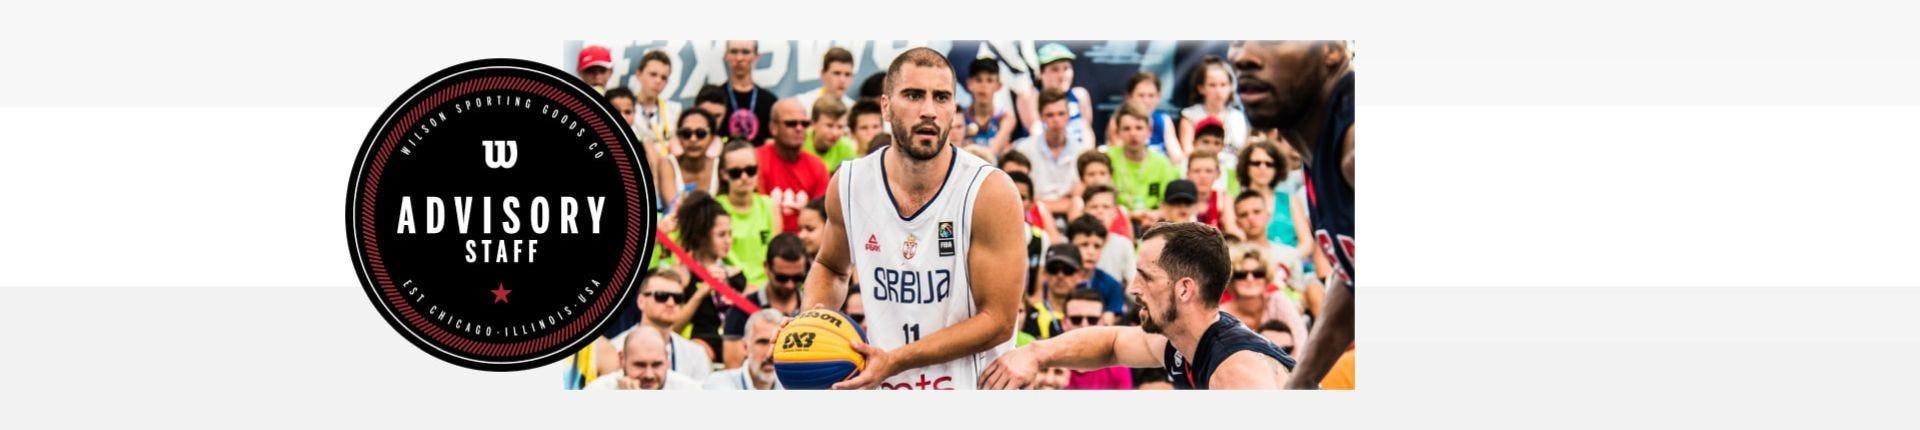 Dusan Bulut FIBA 3x3 Player